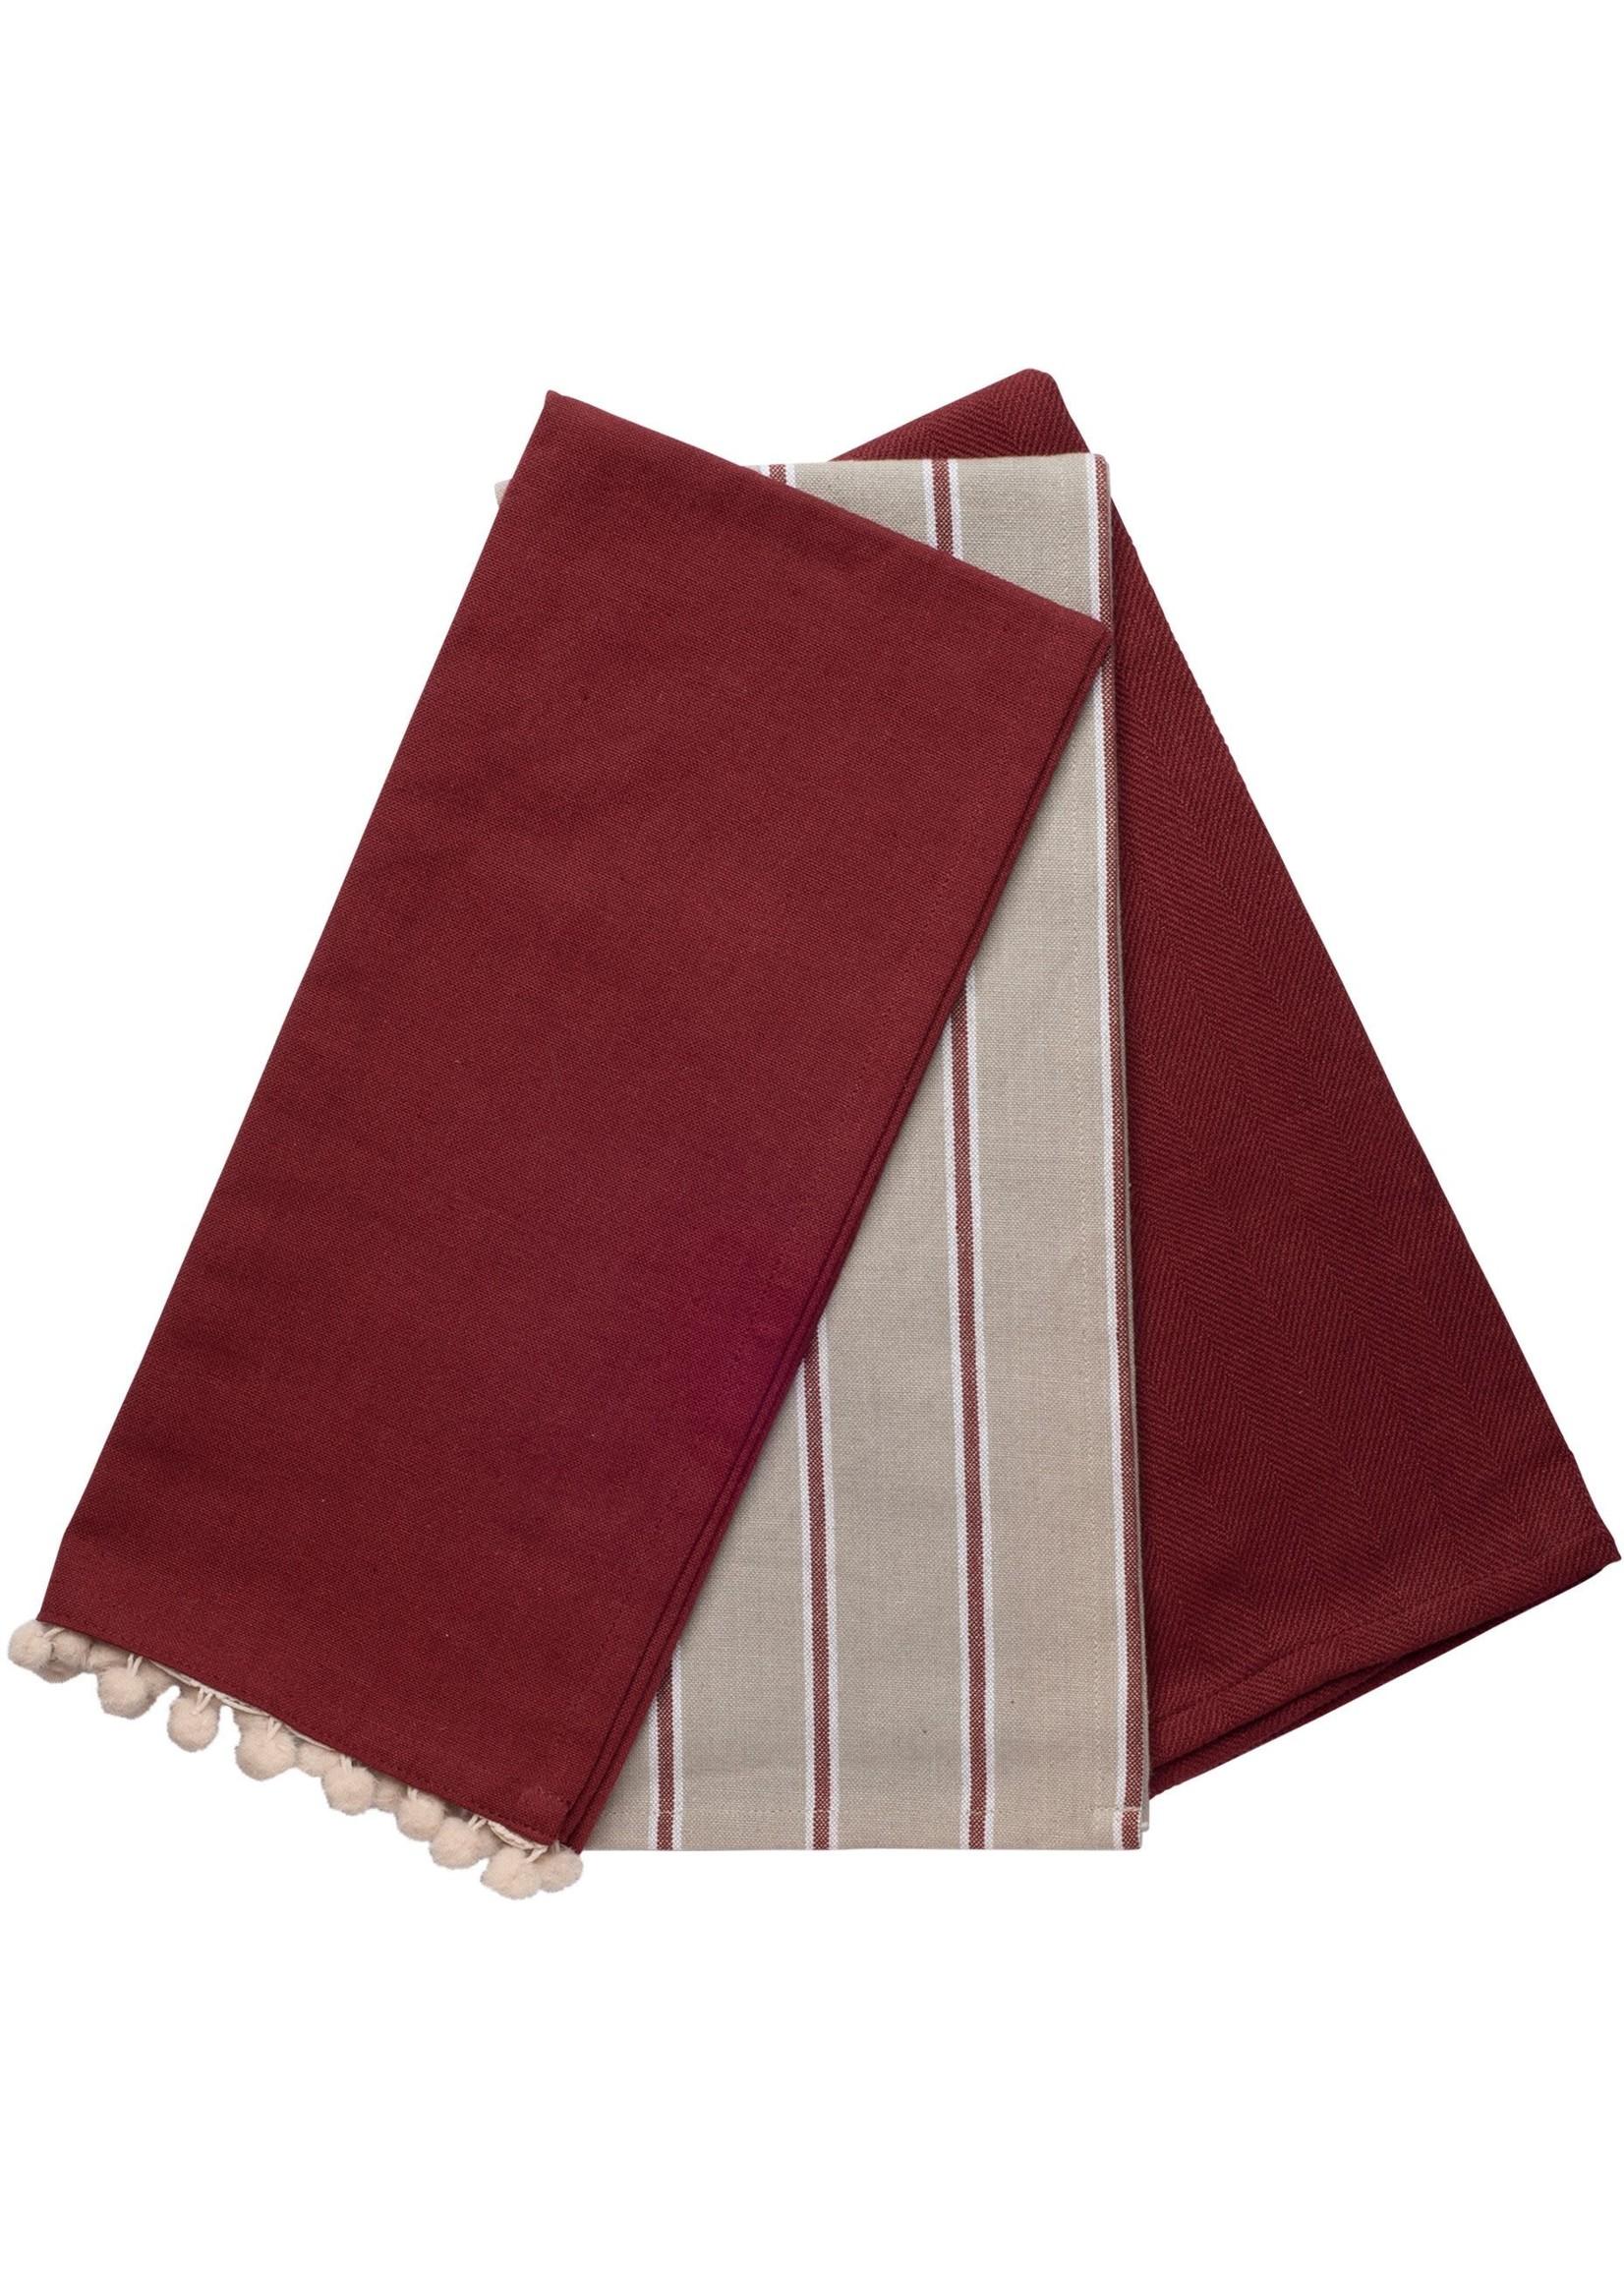 Home Essentials Stripe Mix Pompeian Red Combo Kitchen Towel 3 Pk